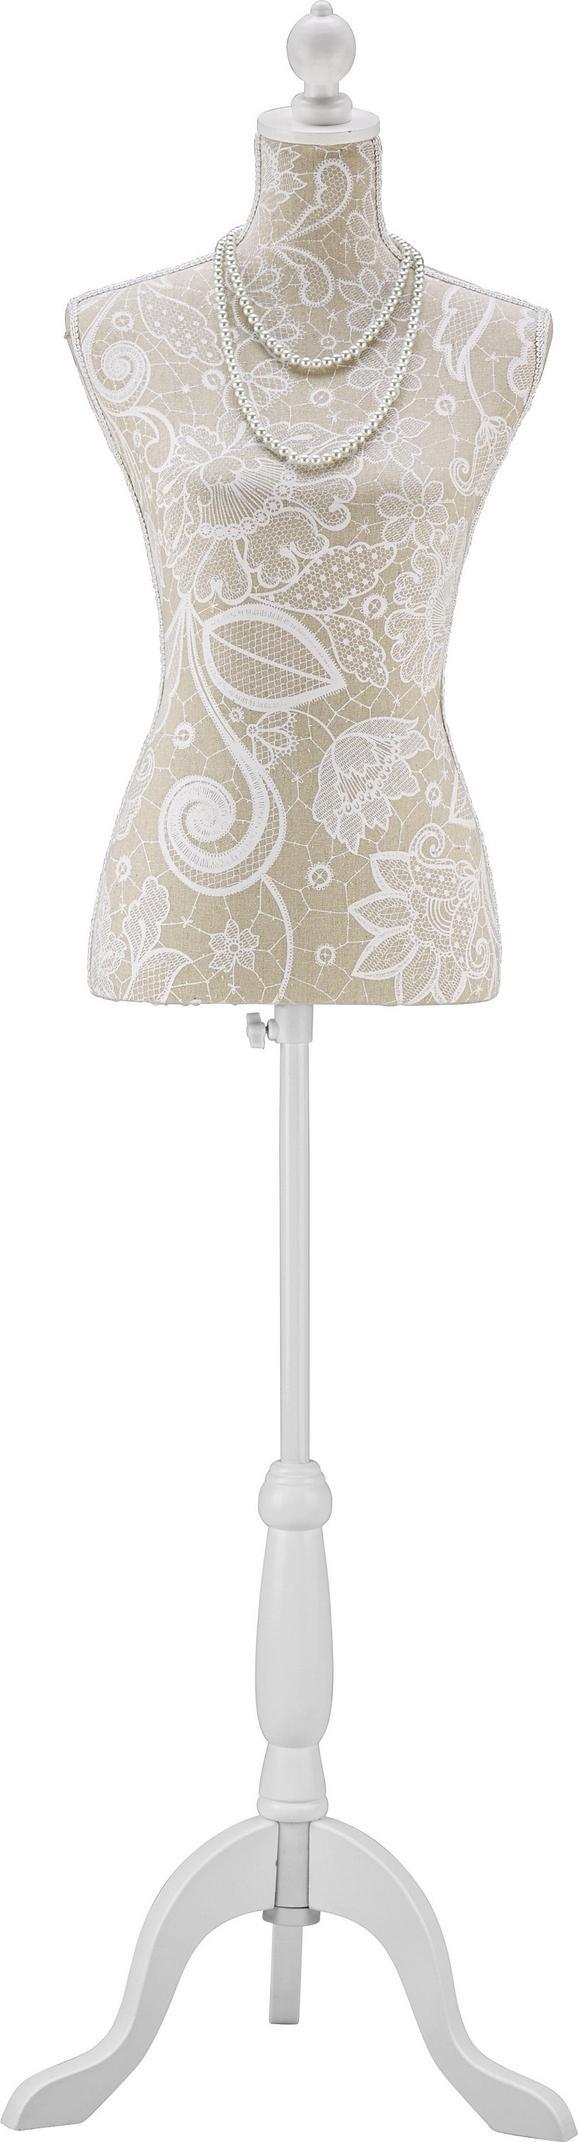 Dekorativna Lutka Mannequin - bela/bež, Romantika, leseni material/tekstil (35/170/21cm) - Mömax modern living